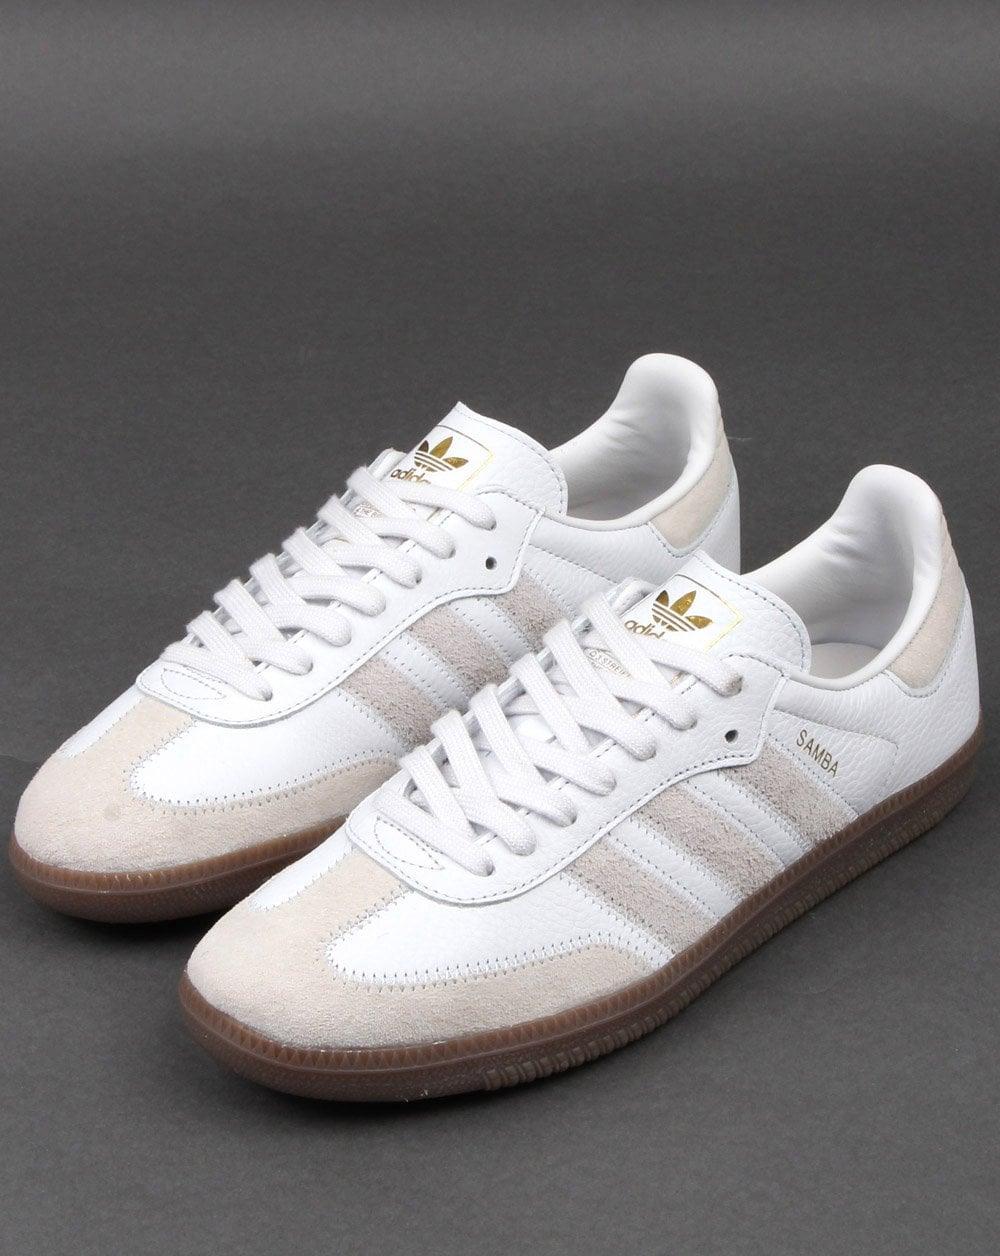 Adidas Samba Og Ft Trainers Crystal White 7dbfd80b4